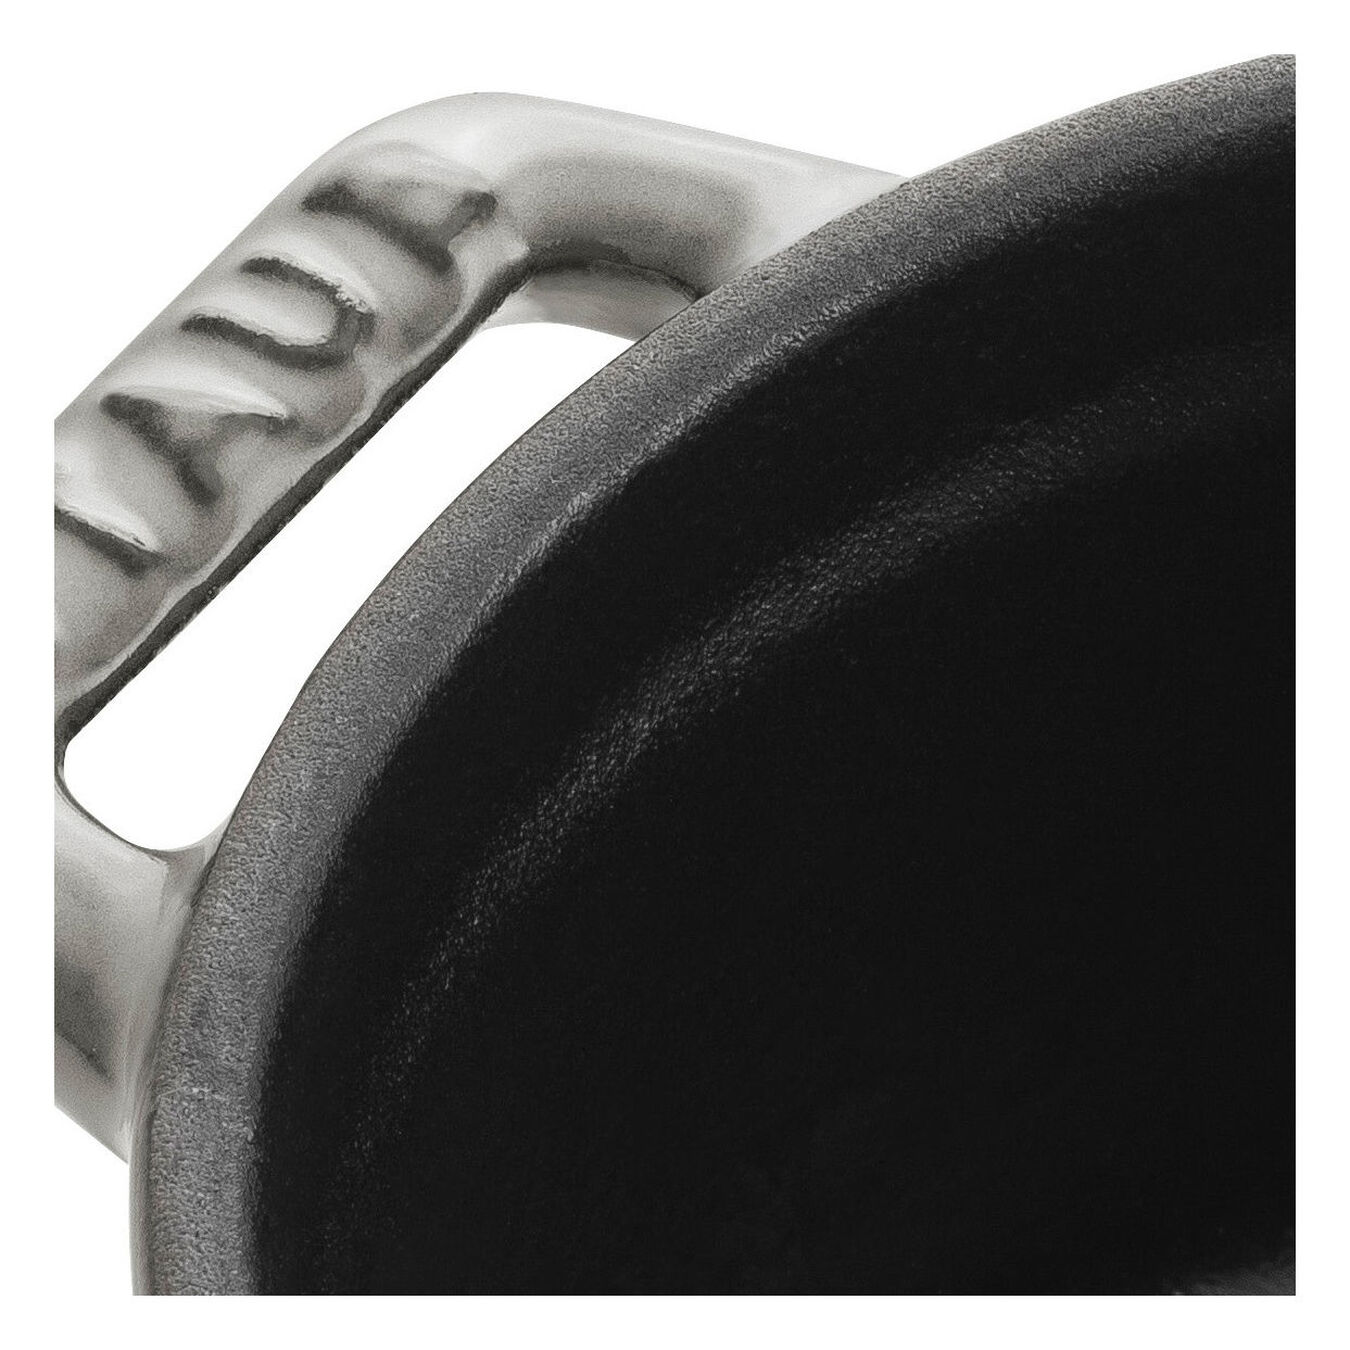 Mini Cocotte 10 cm, rund, Grau, Gusseisen,,large 3